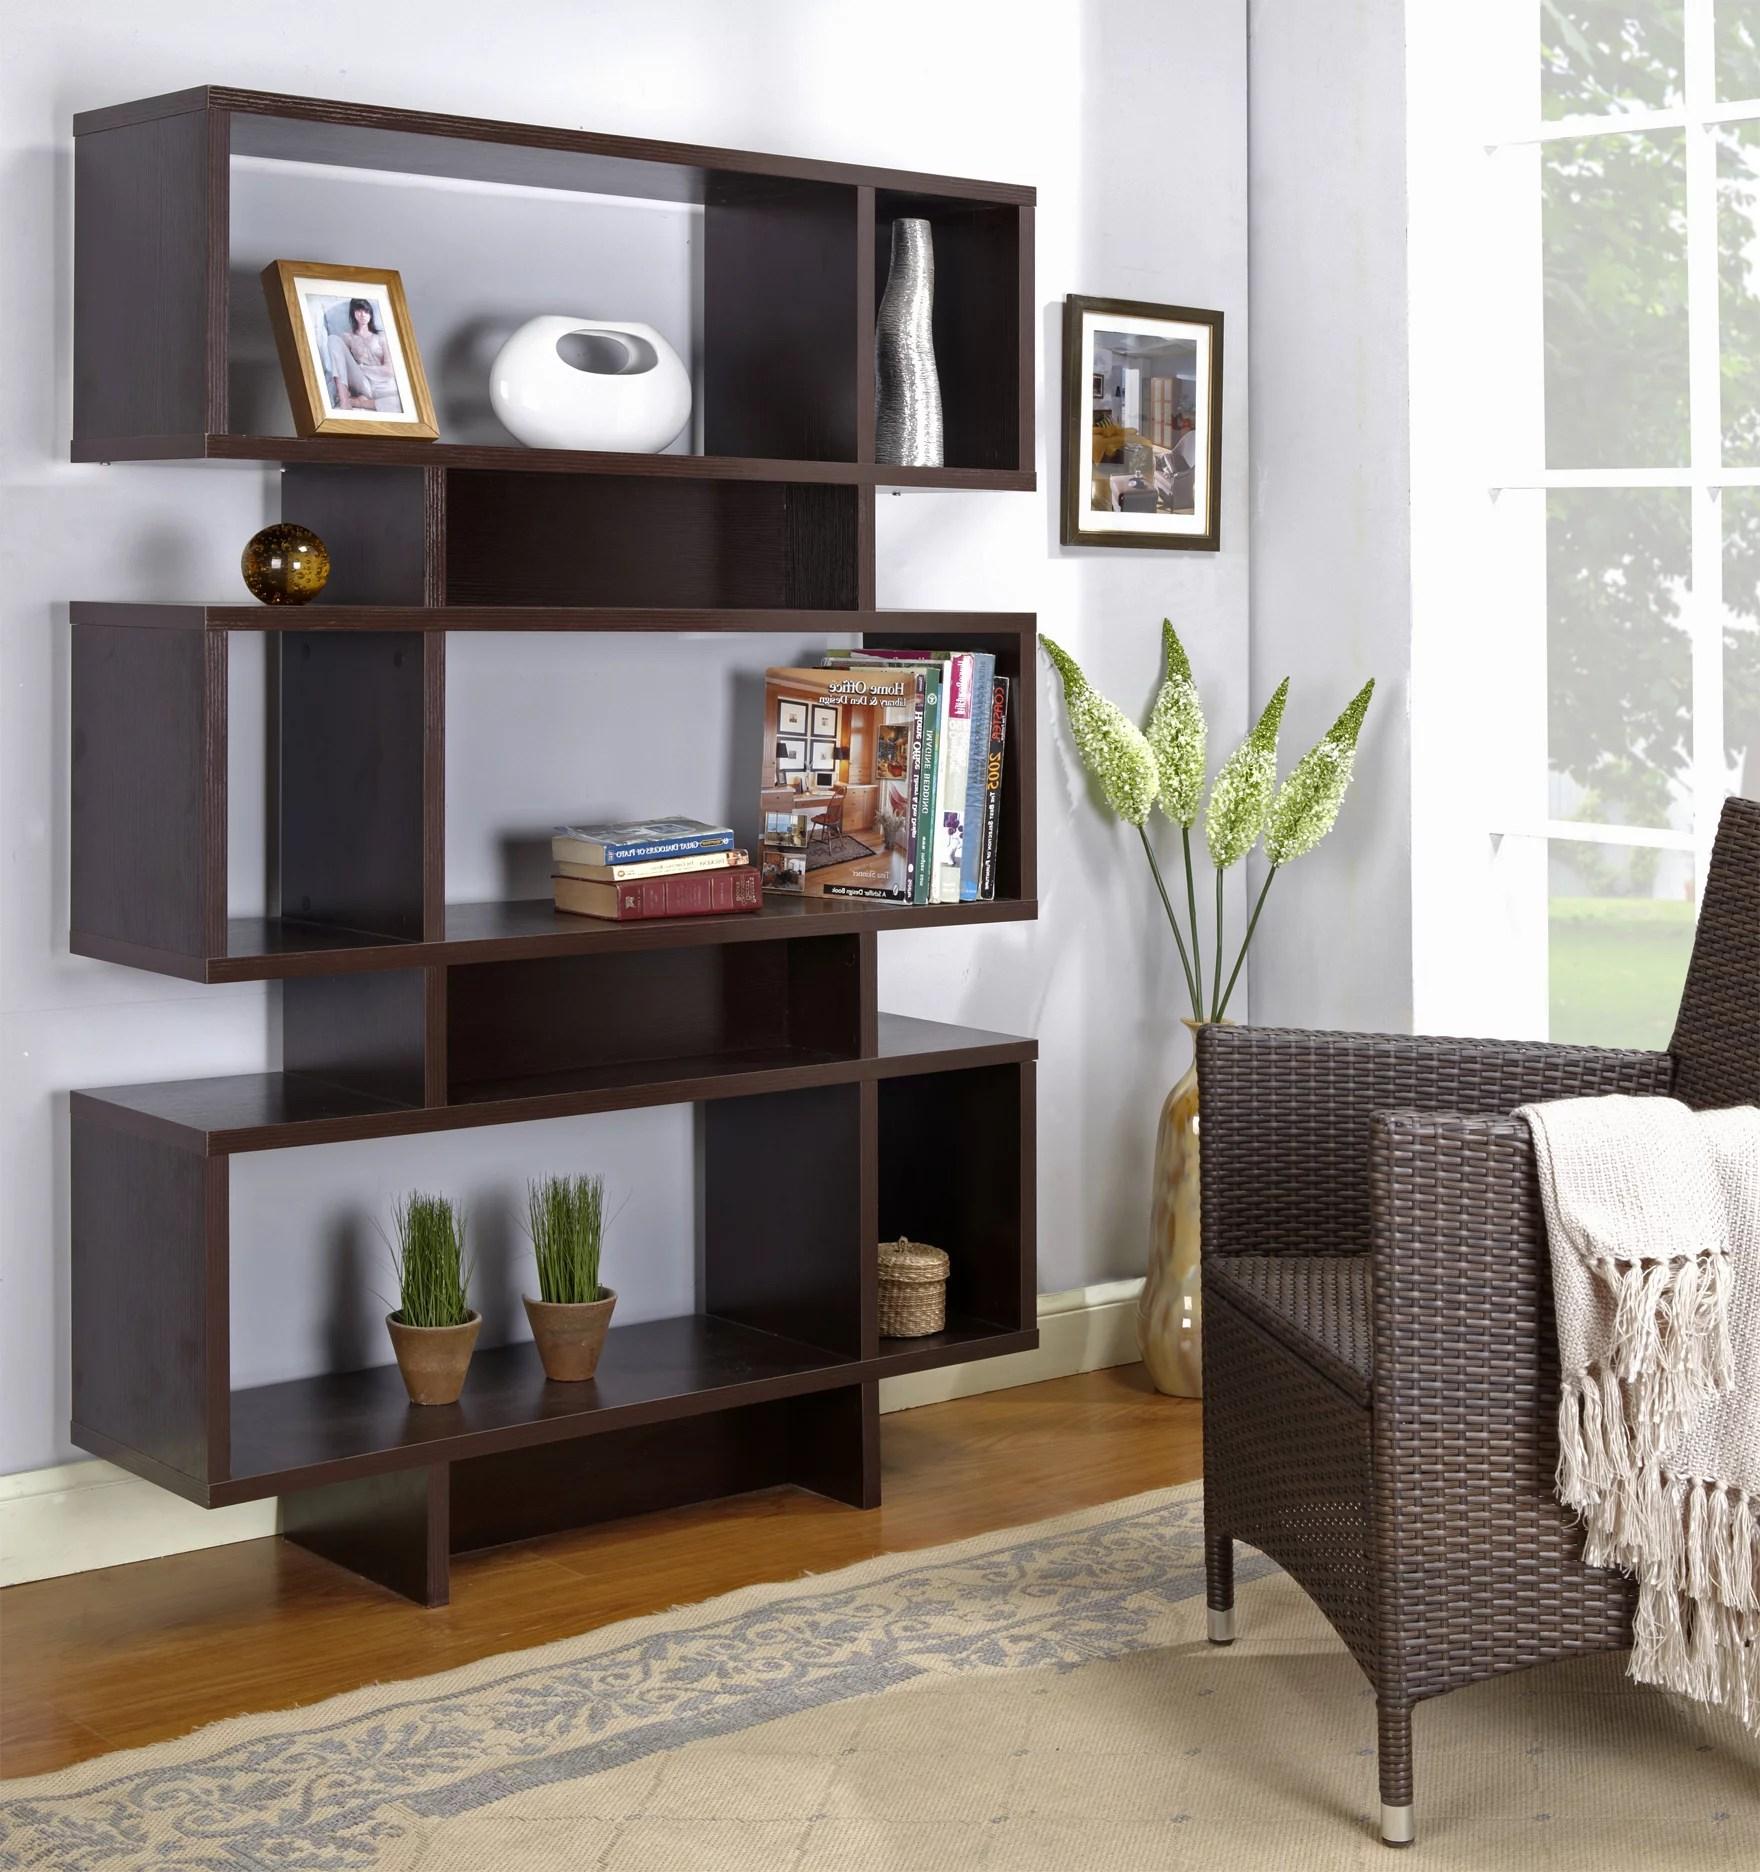 Espresso Wood 12 Cube 5 Tier Bookcase Display Shelves